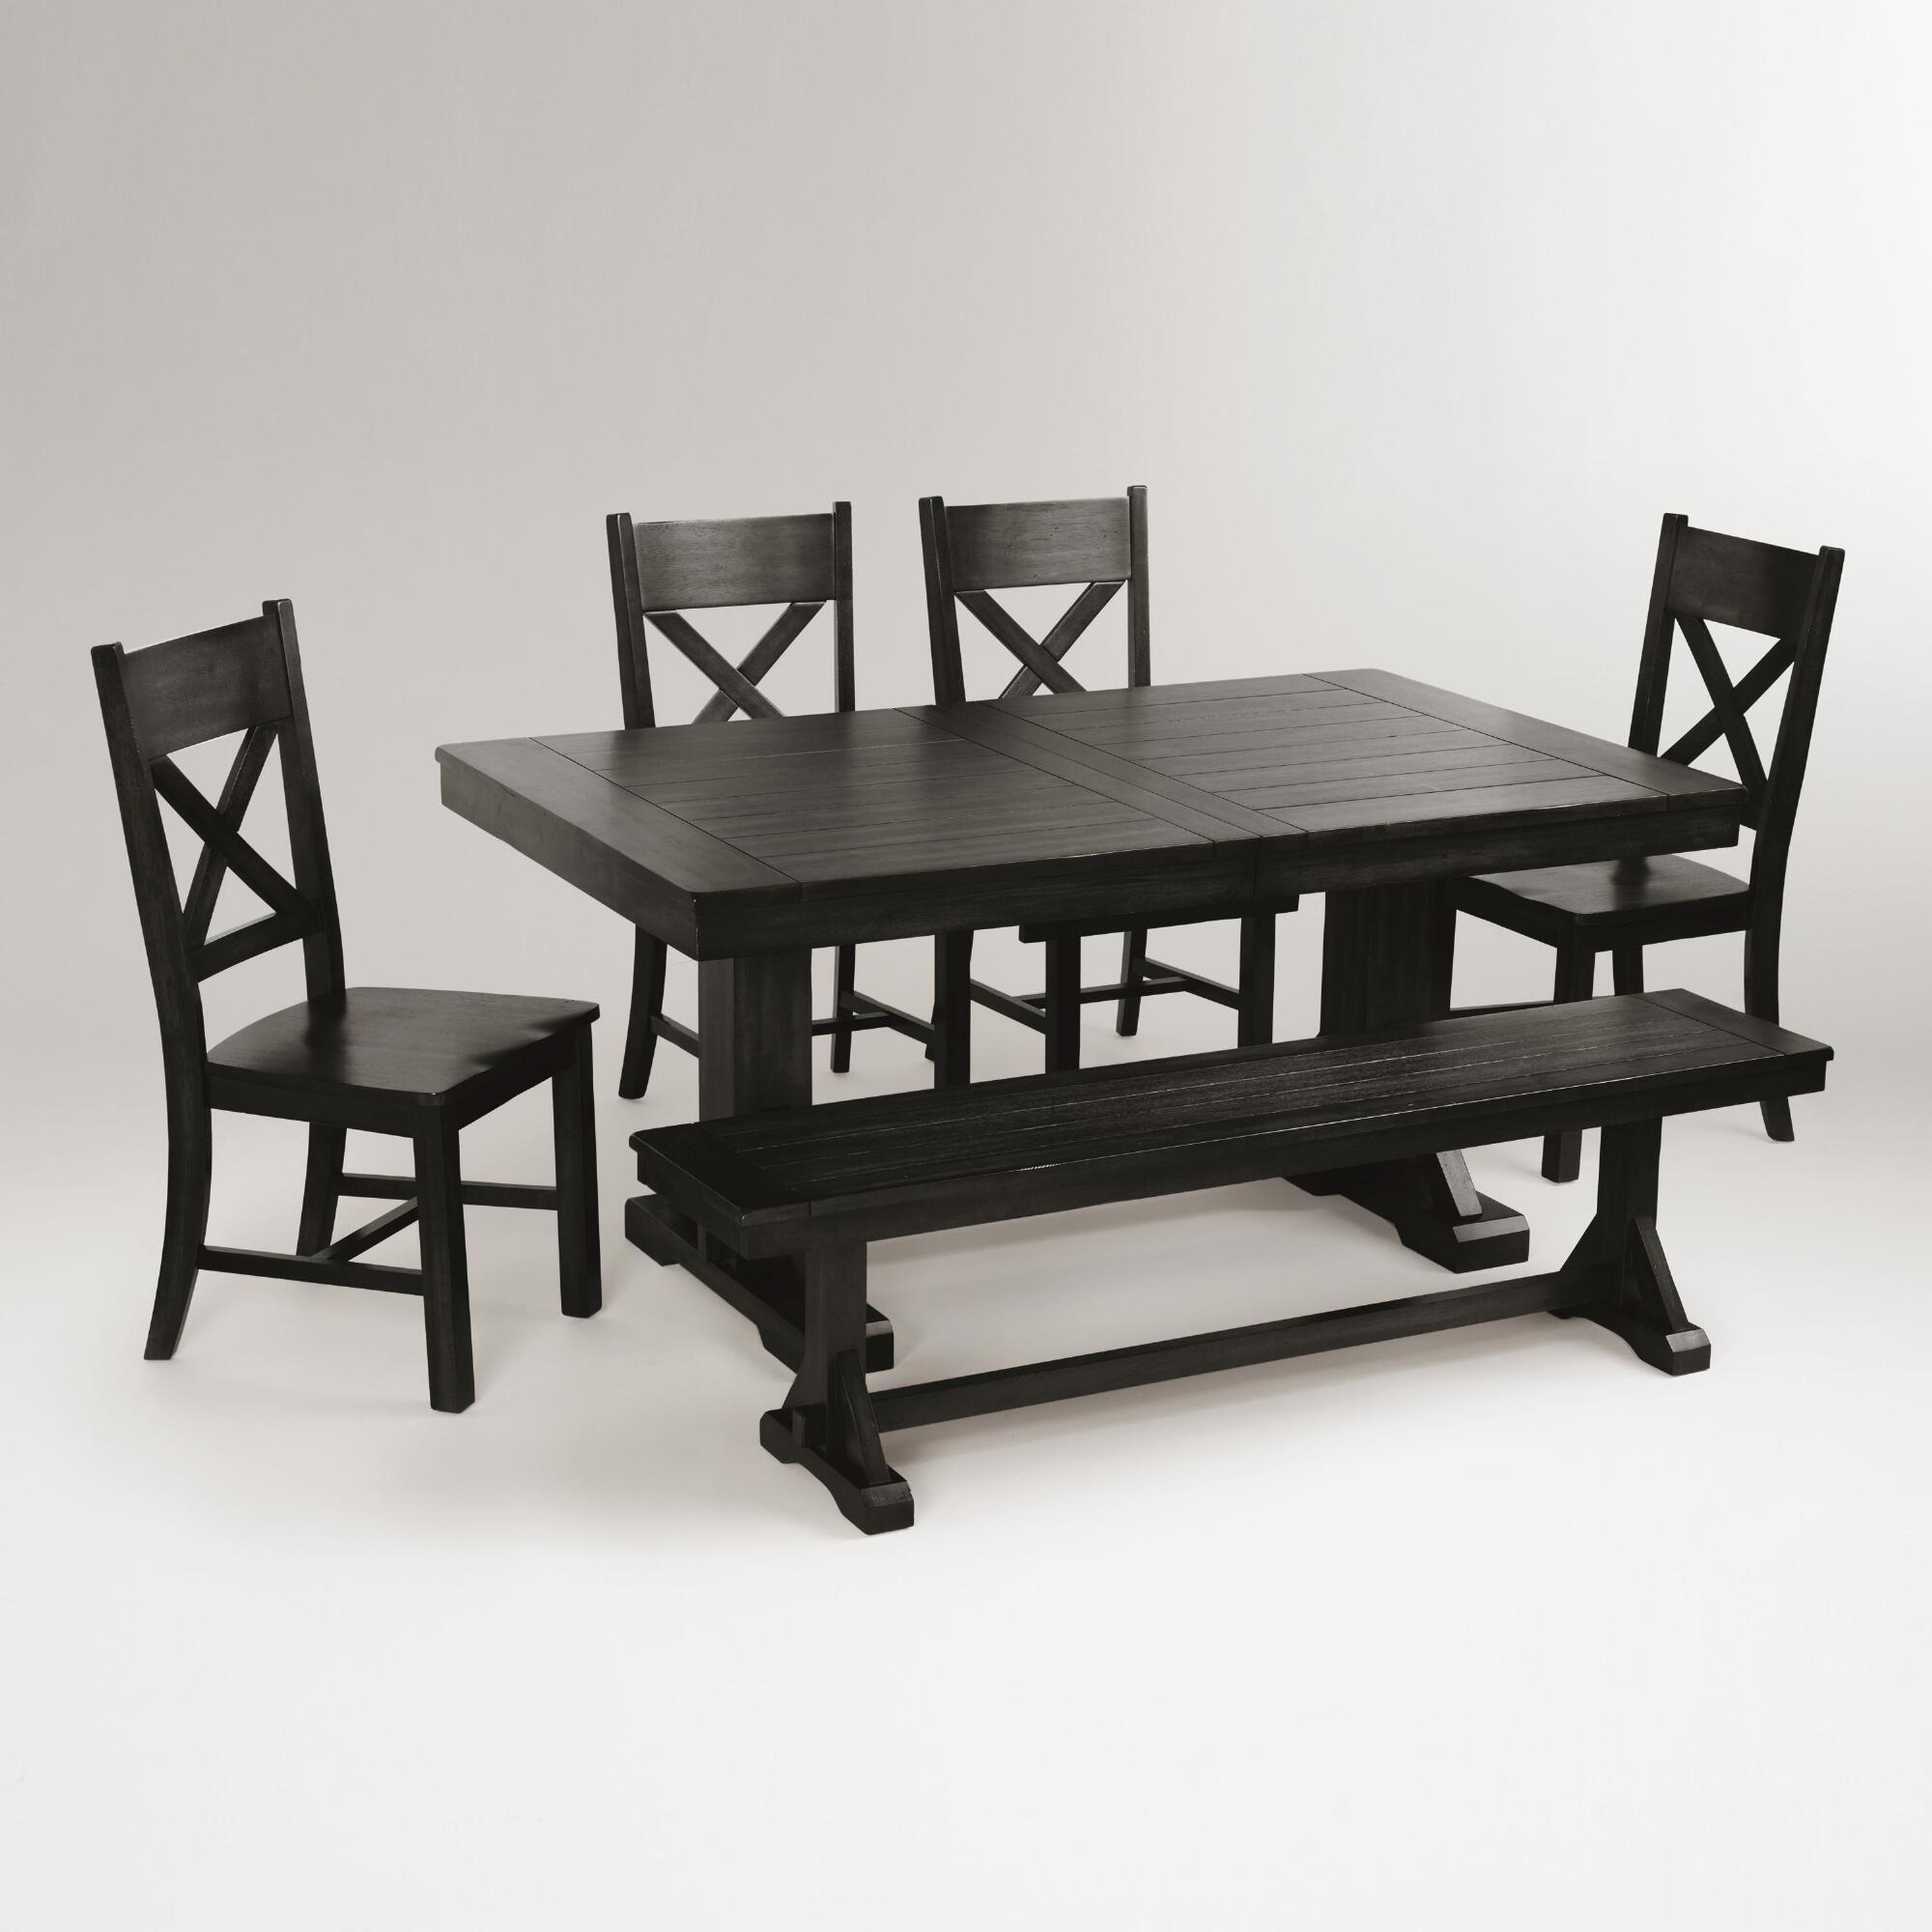 549 Antique Black Verona Trestle Table World Market